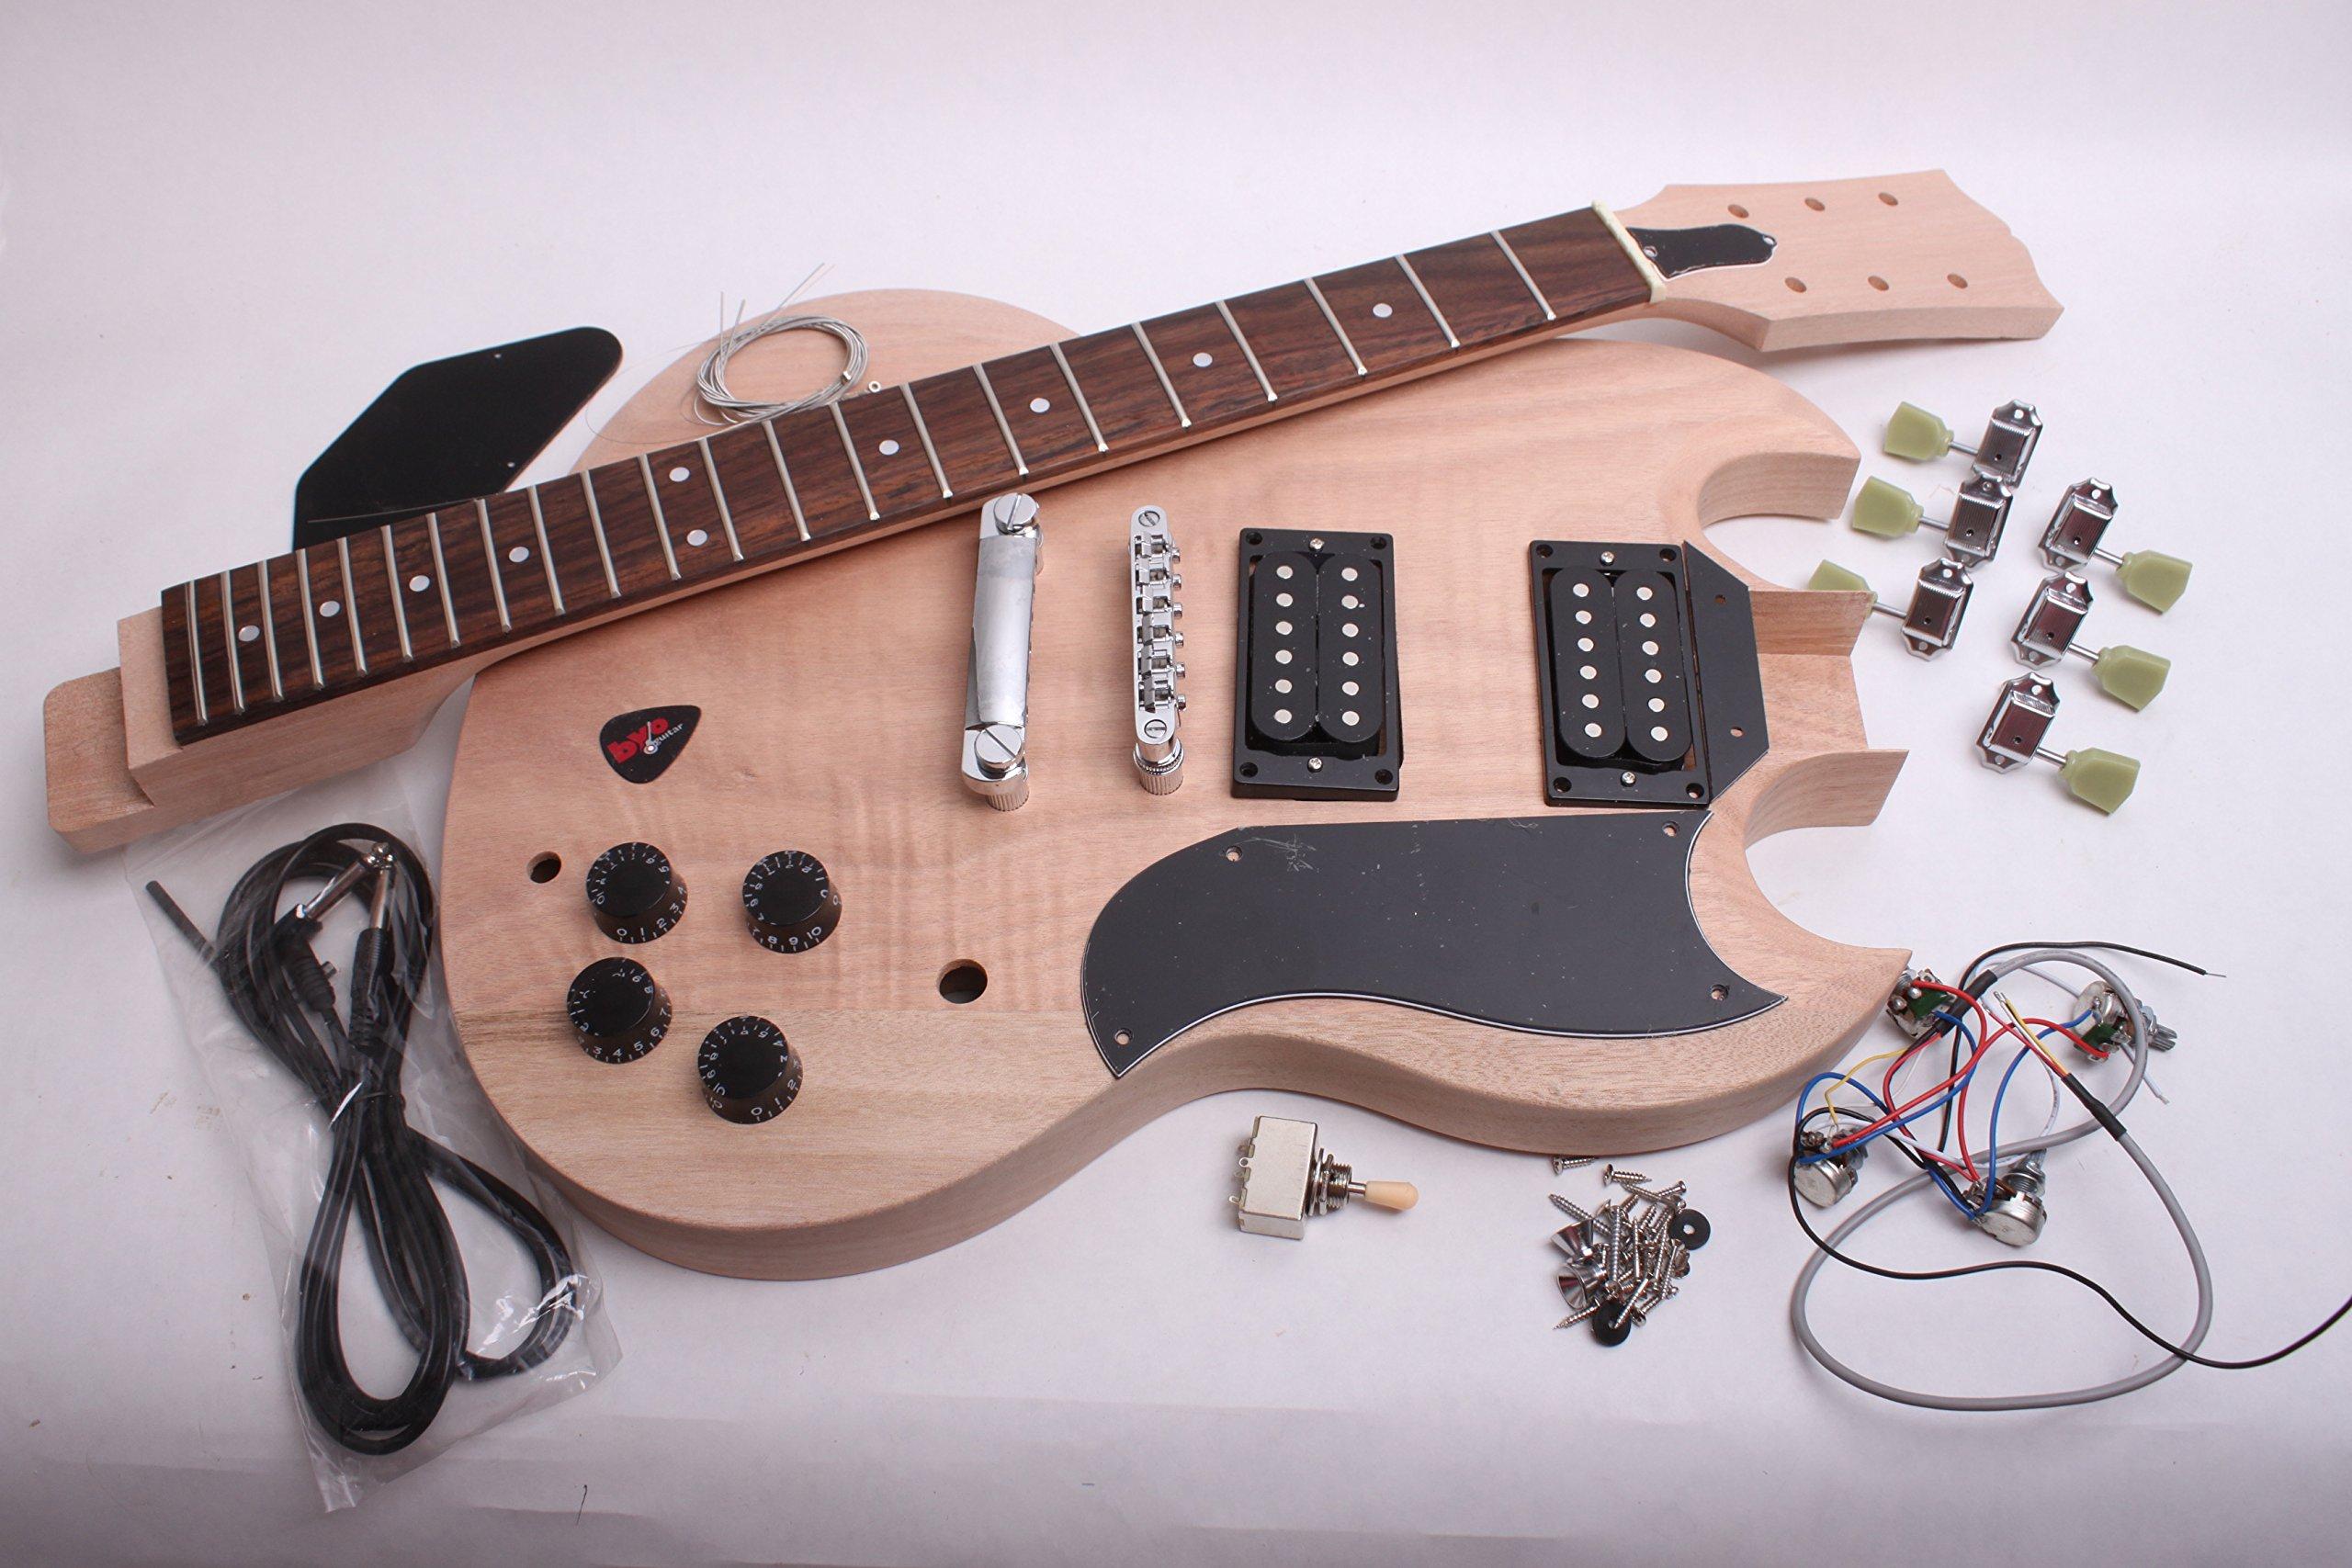 Cheap SG Electric Guitar Kit Black Friday & Cyber Monday 2019